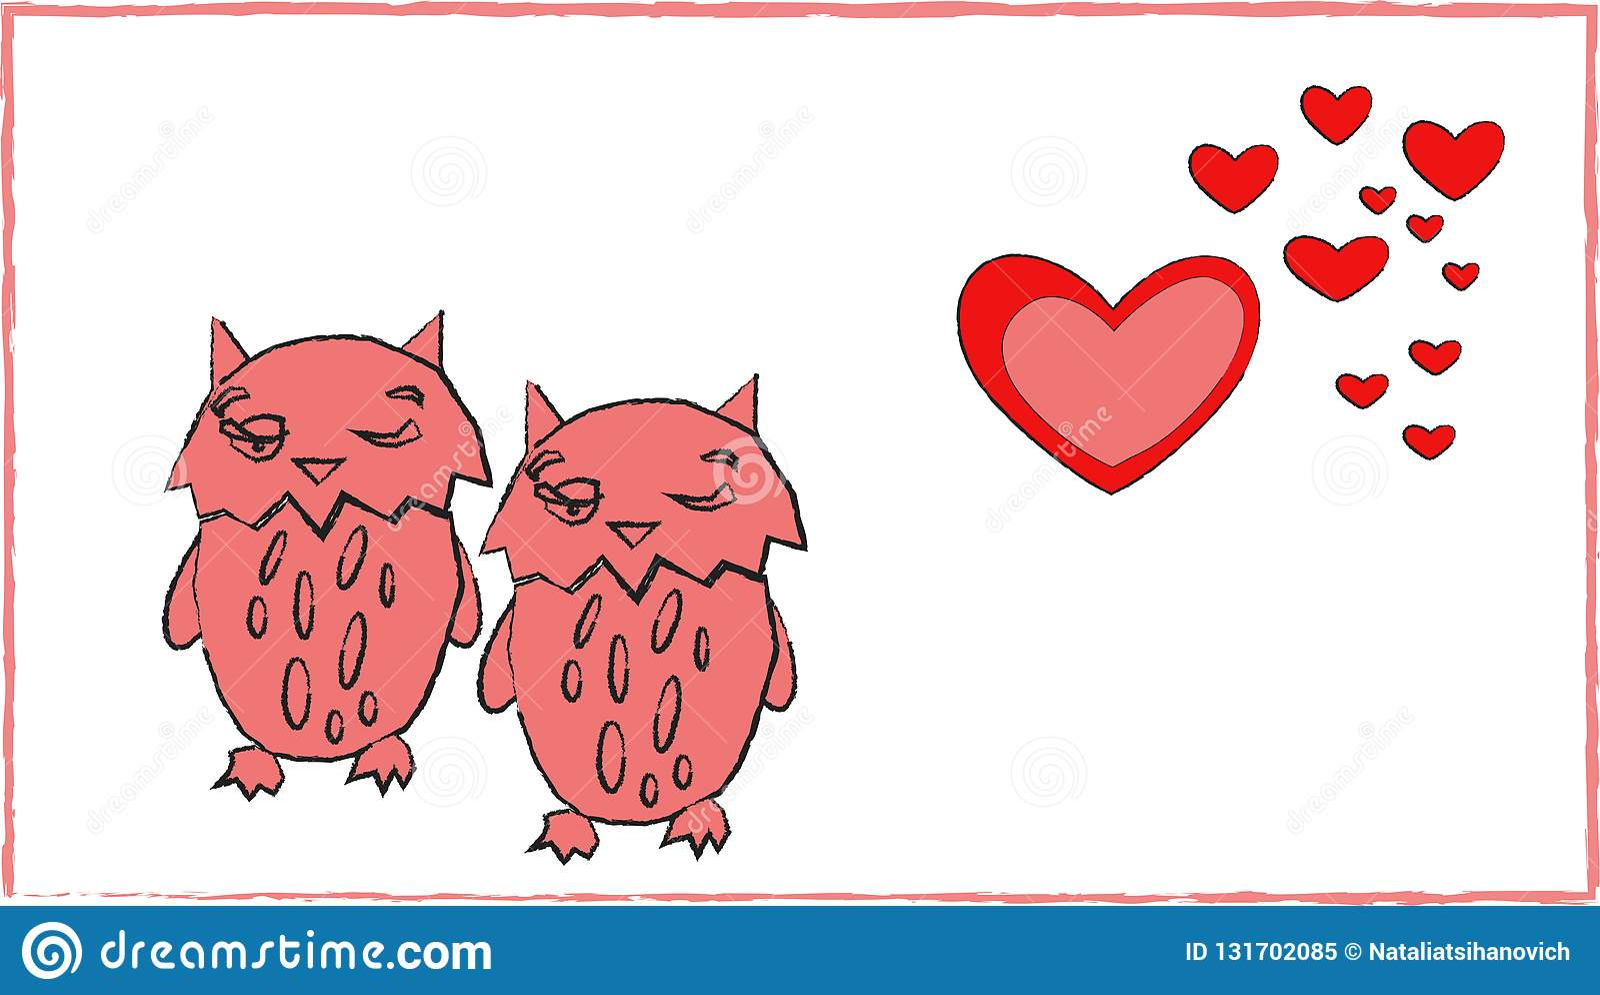 Love of owls heart couple romance animal art